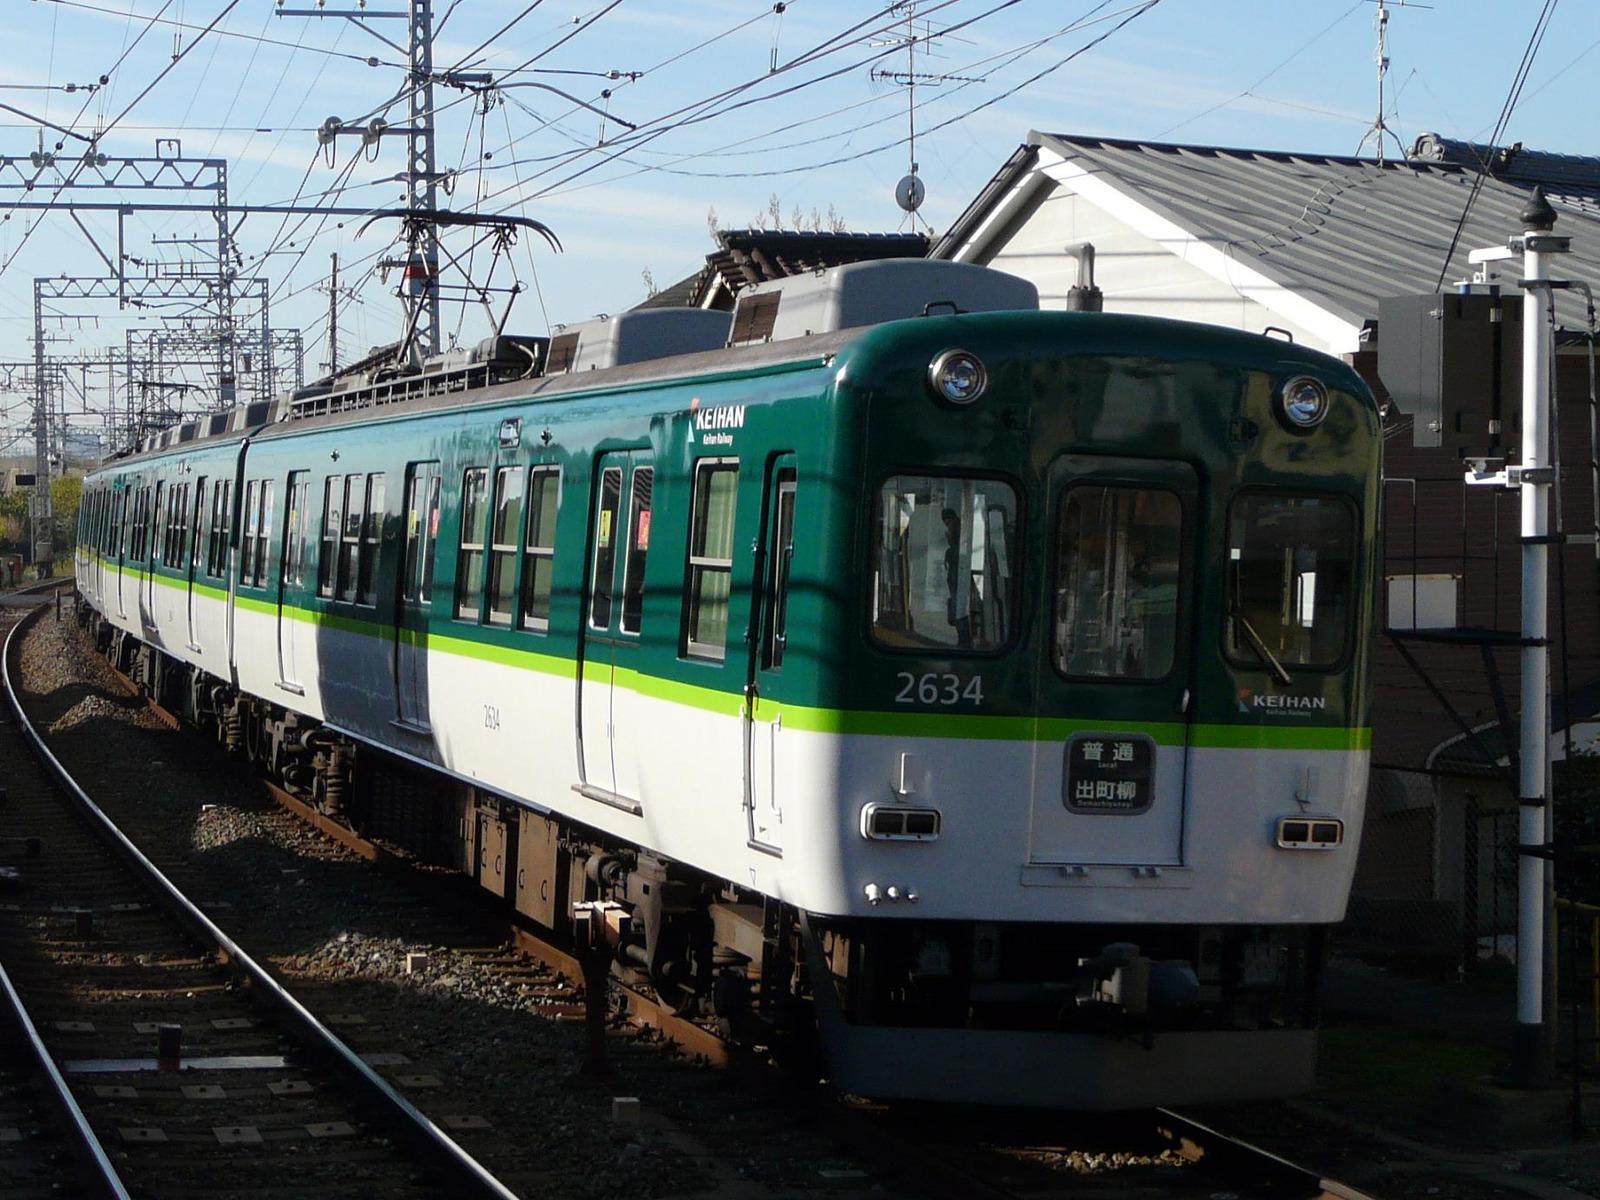 P1210026